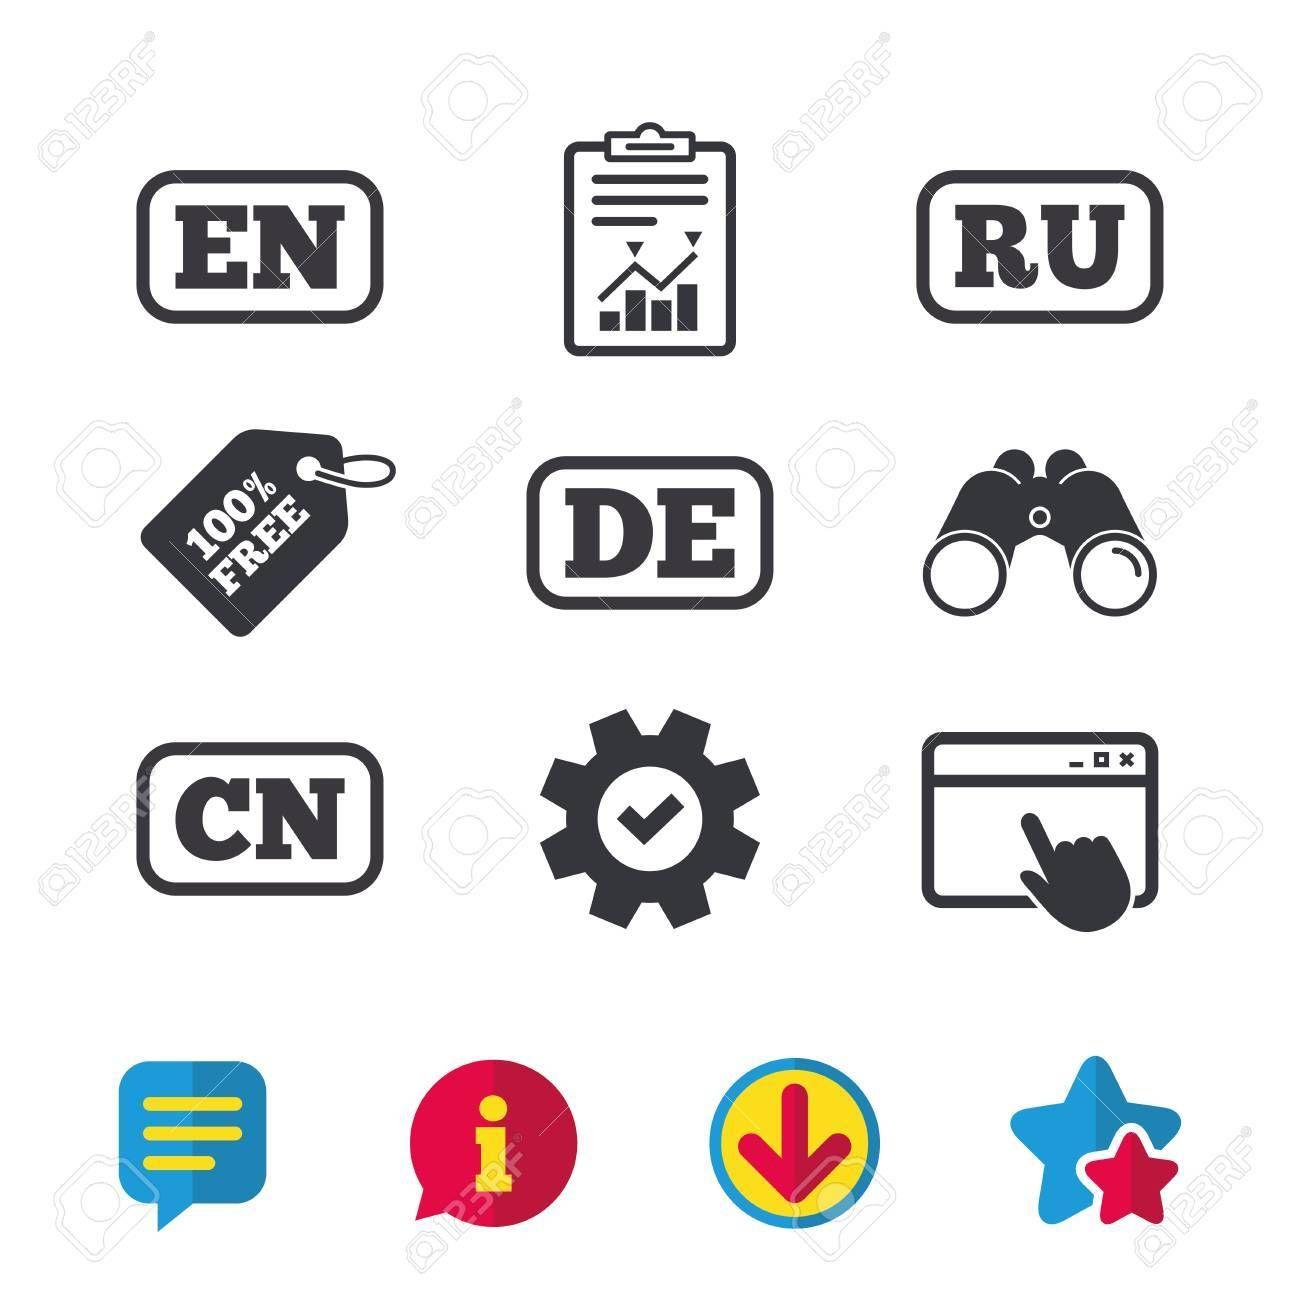 Language Icons En De Ru And Cn Translation Symbols English German Russian And Chinese Languages Browser W Pet Logo Design Language Icon Design Tutorials